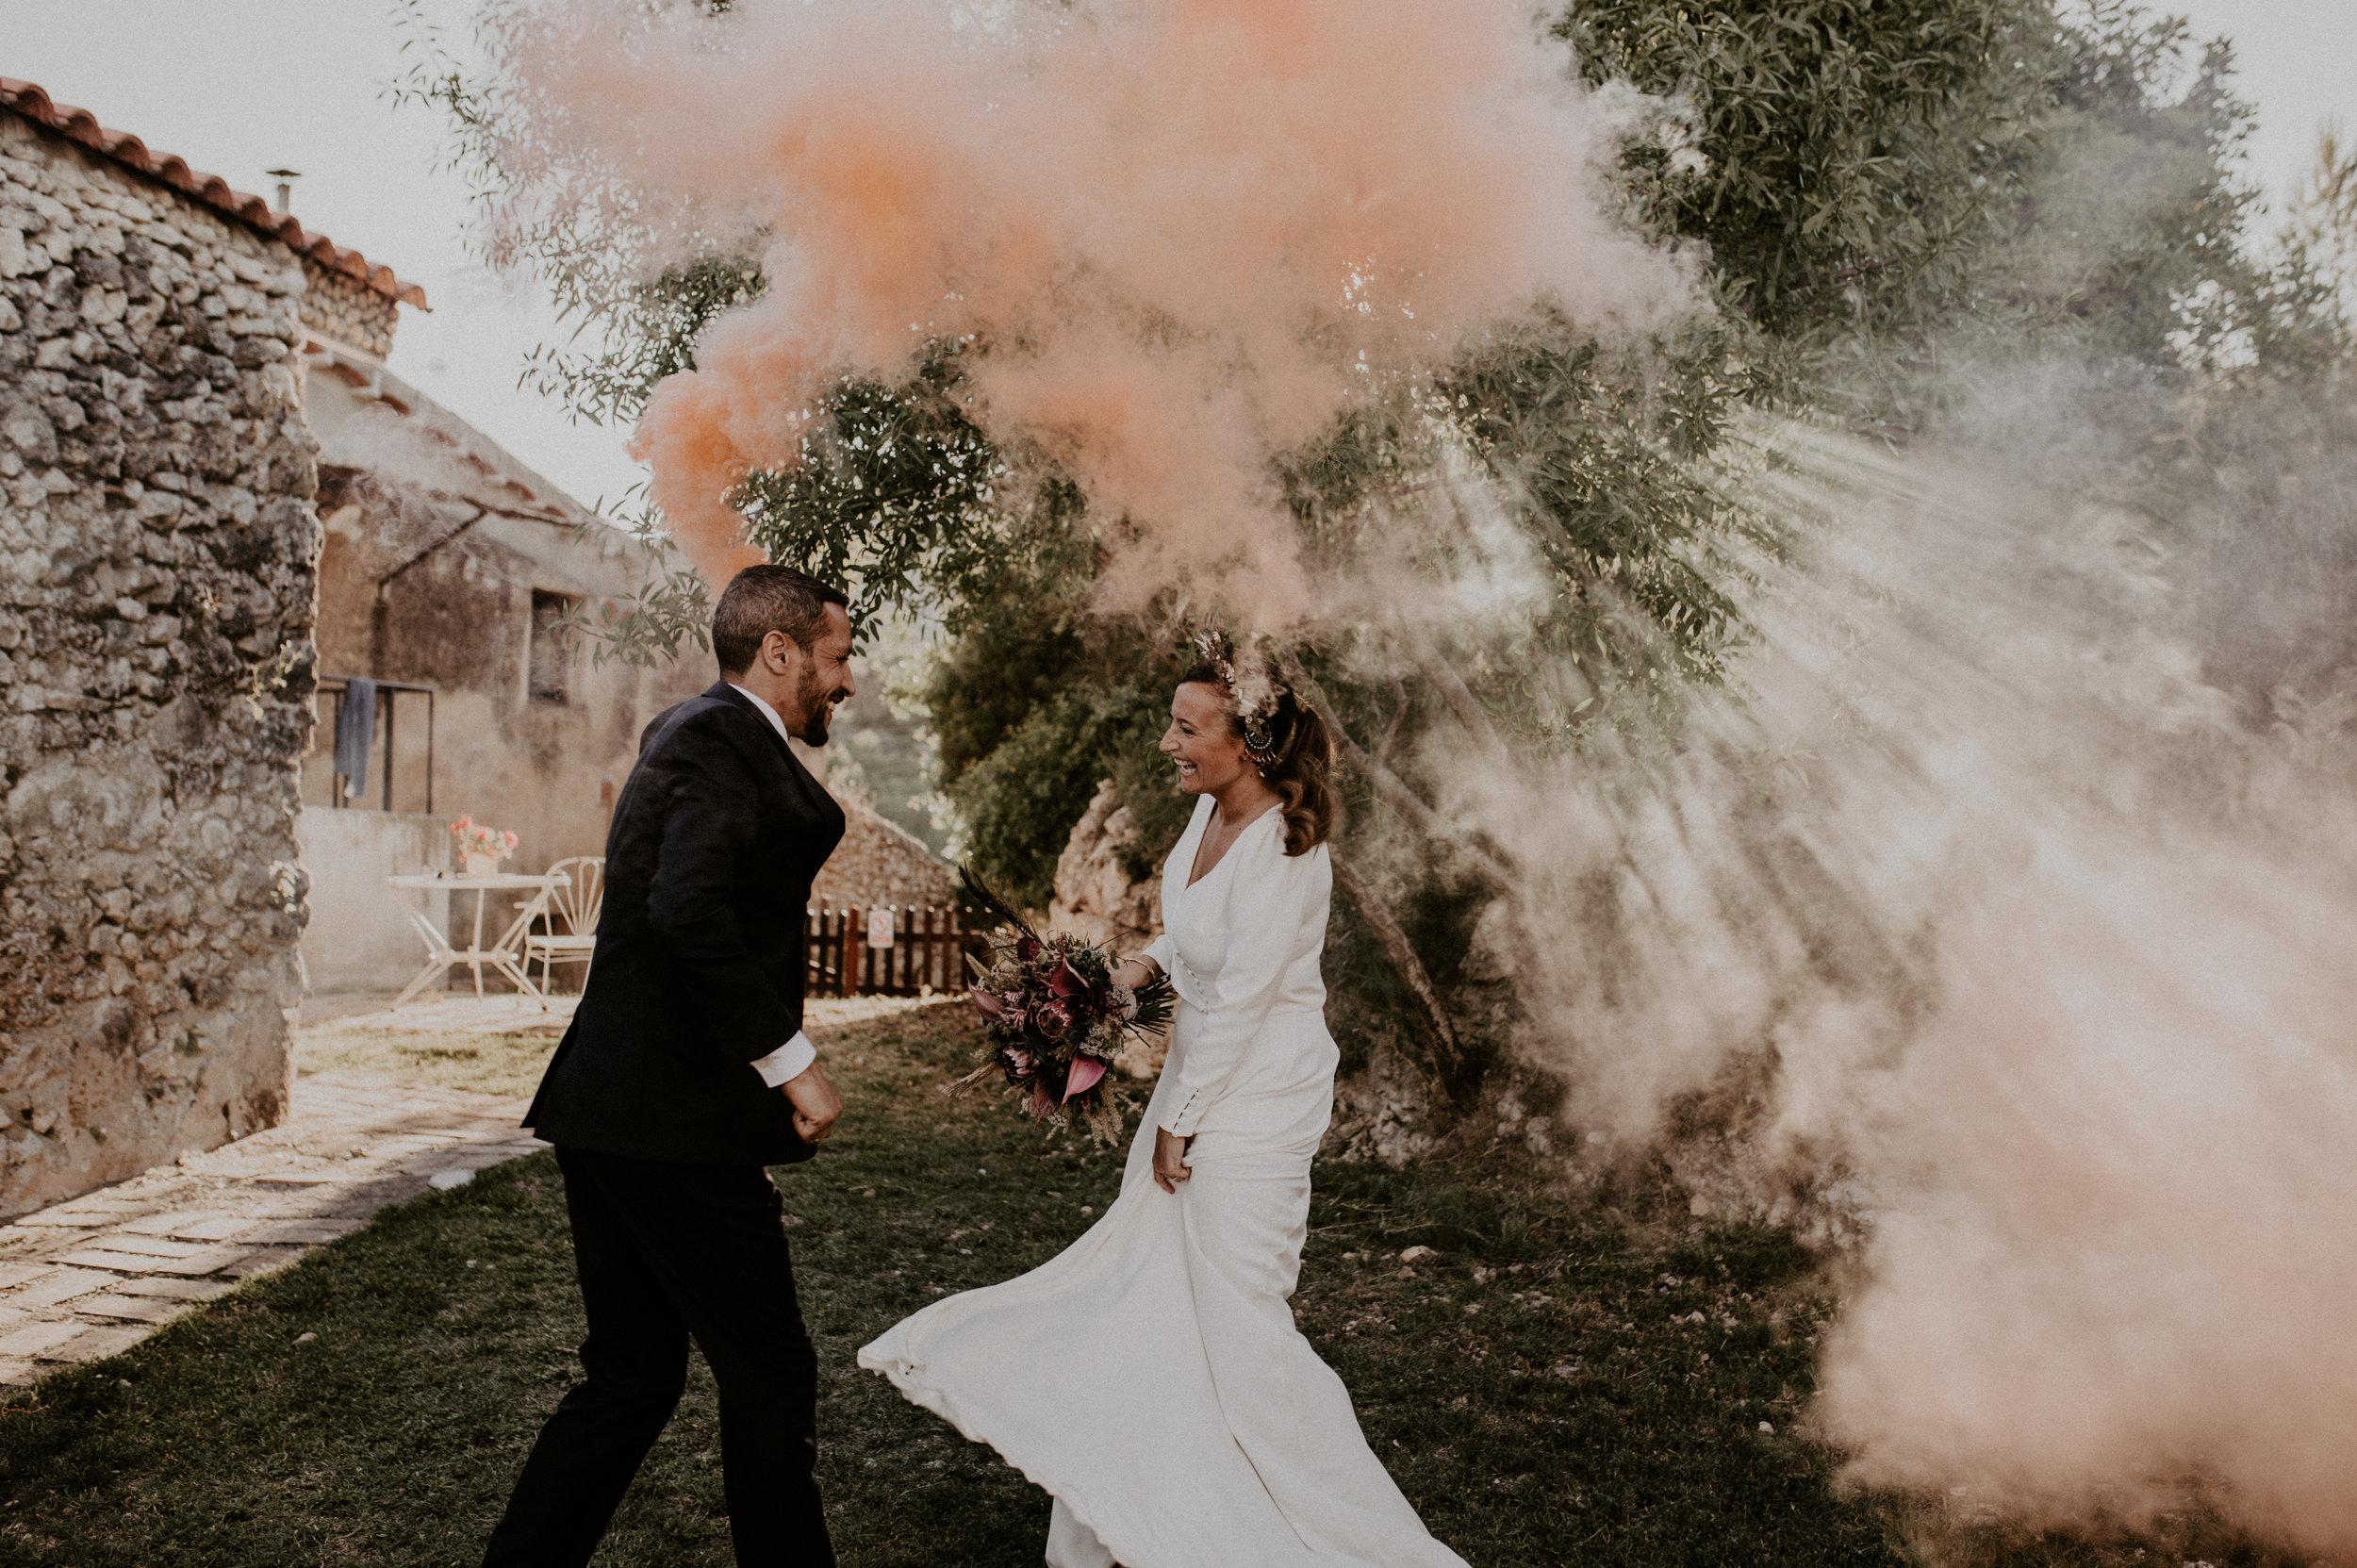 thenortherngirlphotography-fotografa-de-bodas-barcelona_destinartion-wedding-photographer_wedding-photographer_moroccan-wedding_HADNANANTIGONA-734.jpg